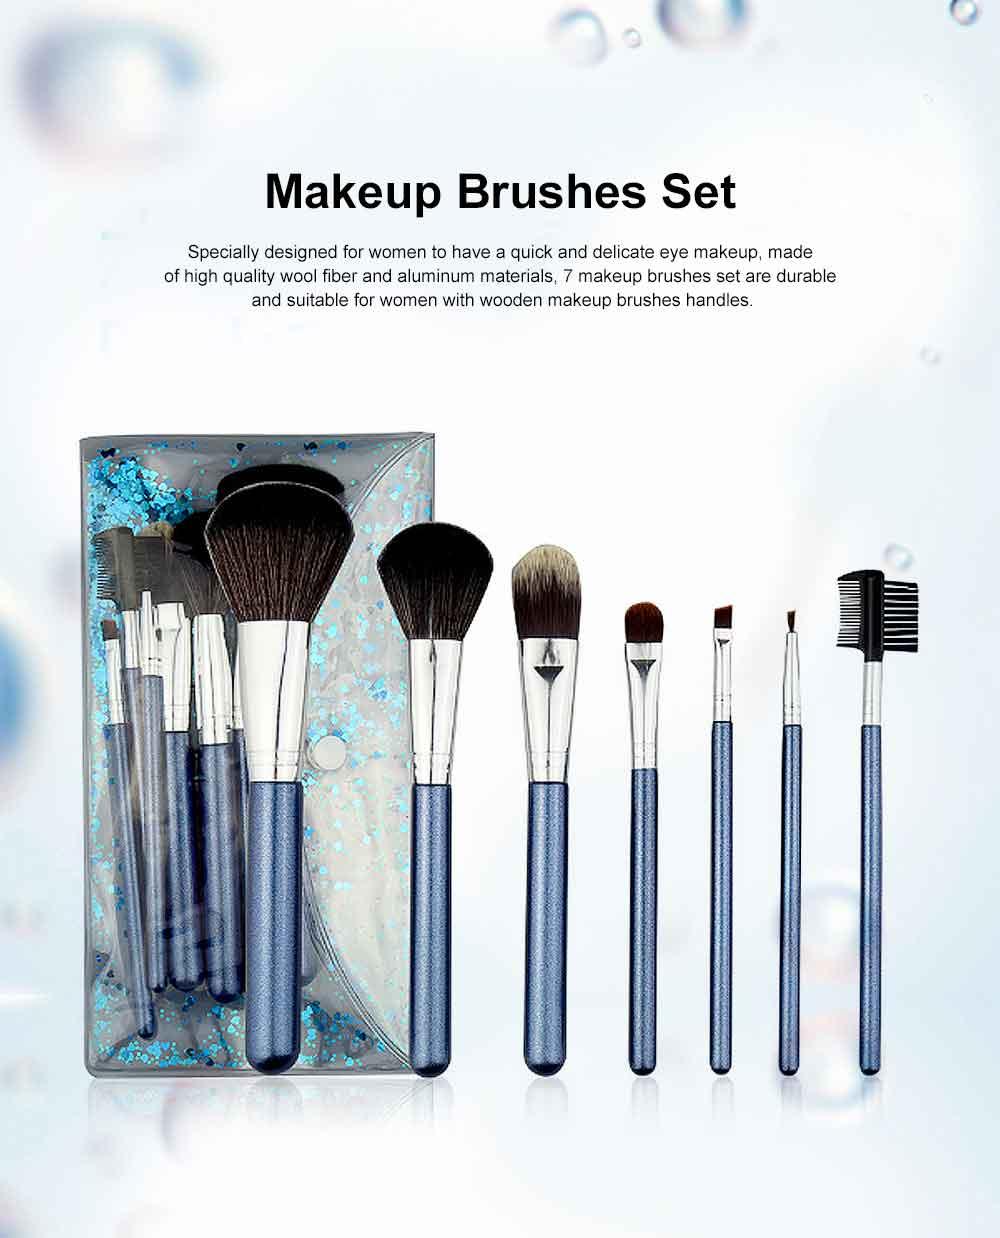 Makeup Brush Set Eye Makeup Brushes for Eye-shadow Concealer Eyeliner Brow Blending Brush Cosmetic Tool 0